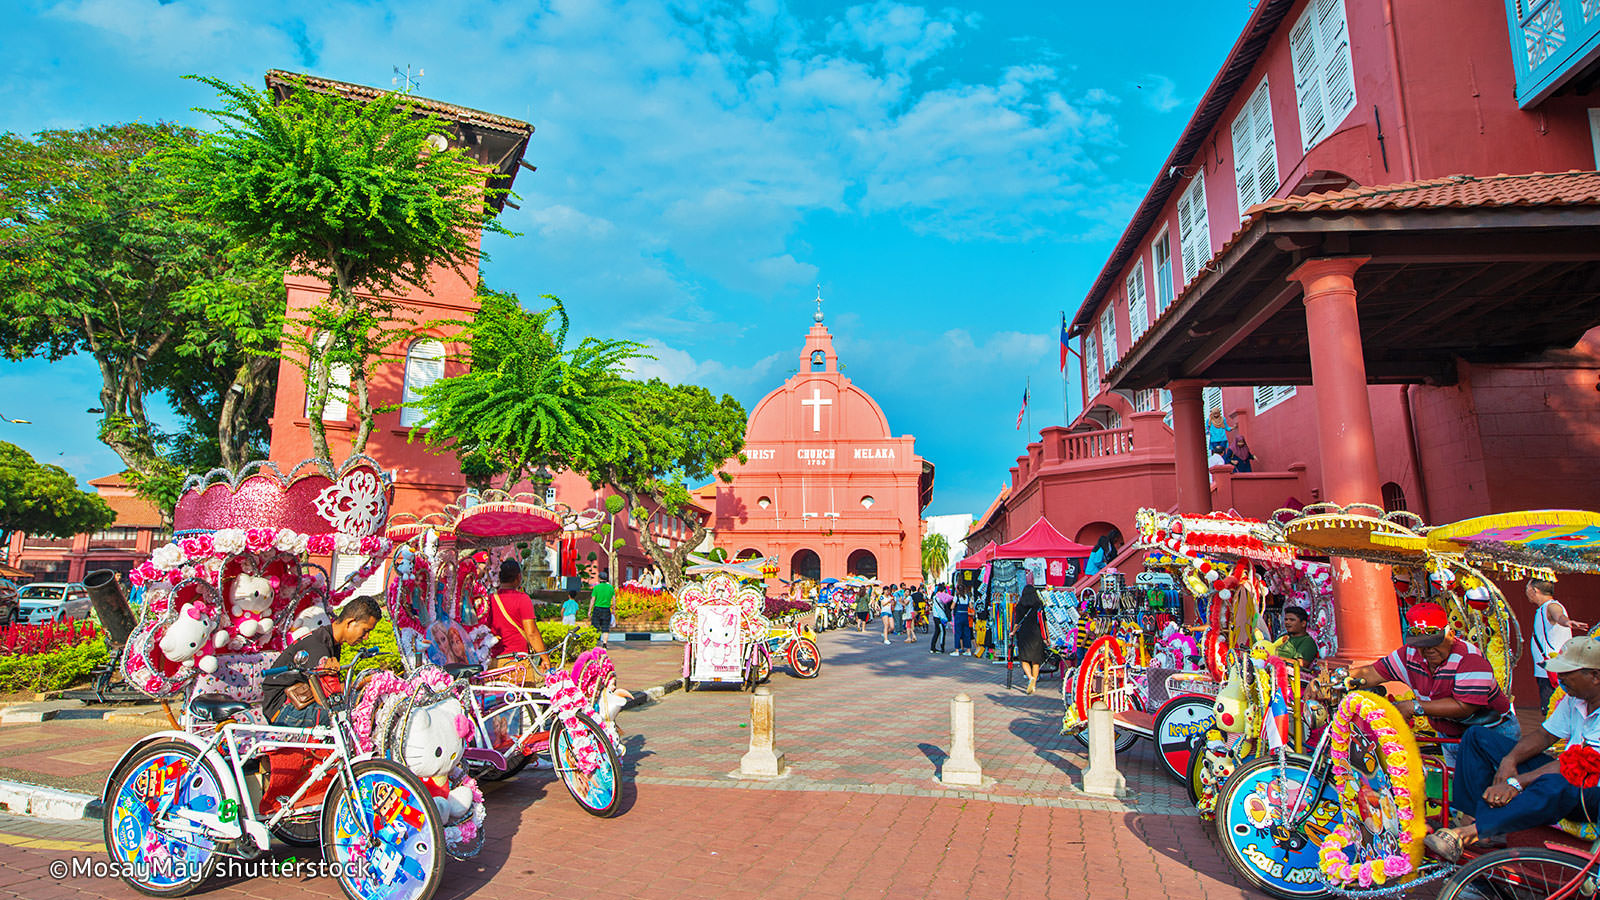 Eye-catching historical sights at Malacca City